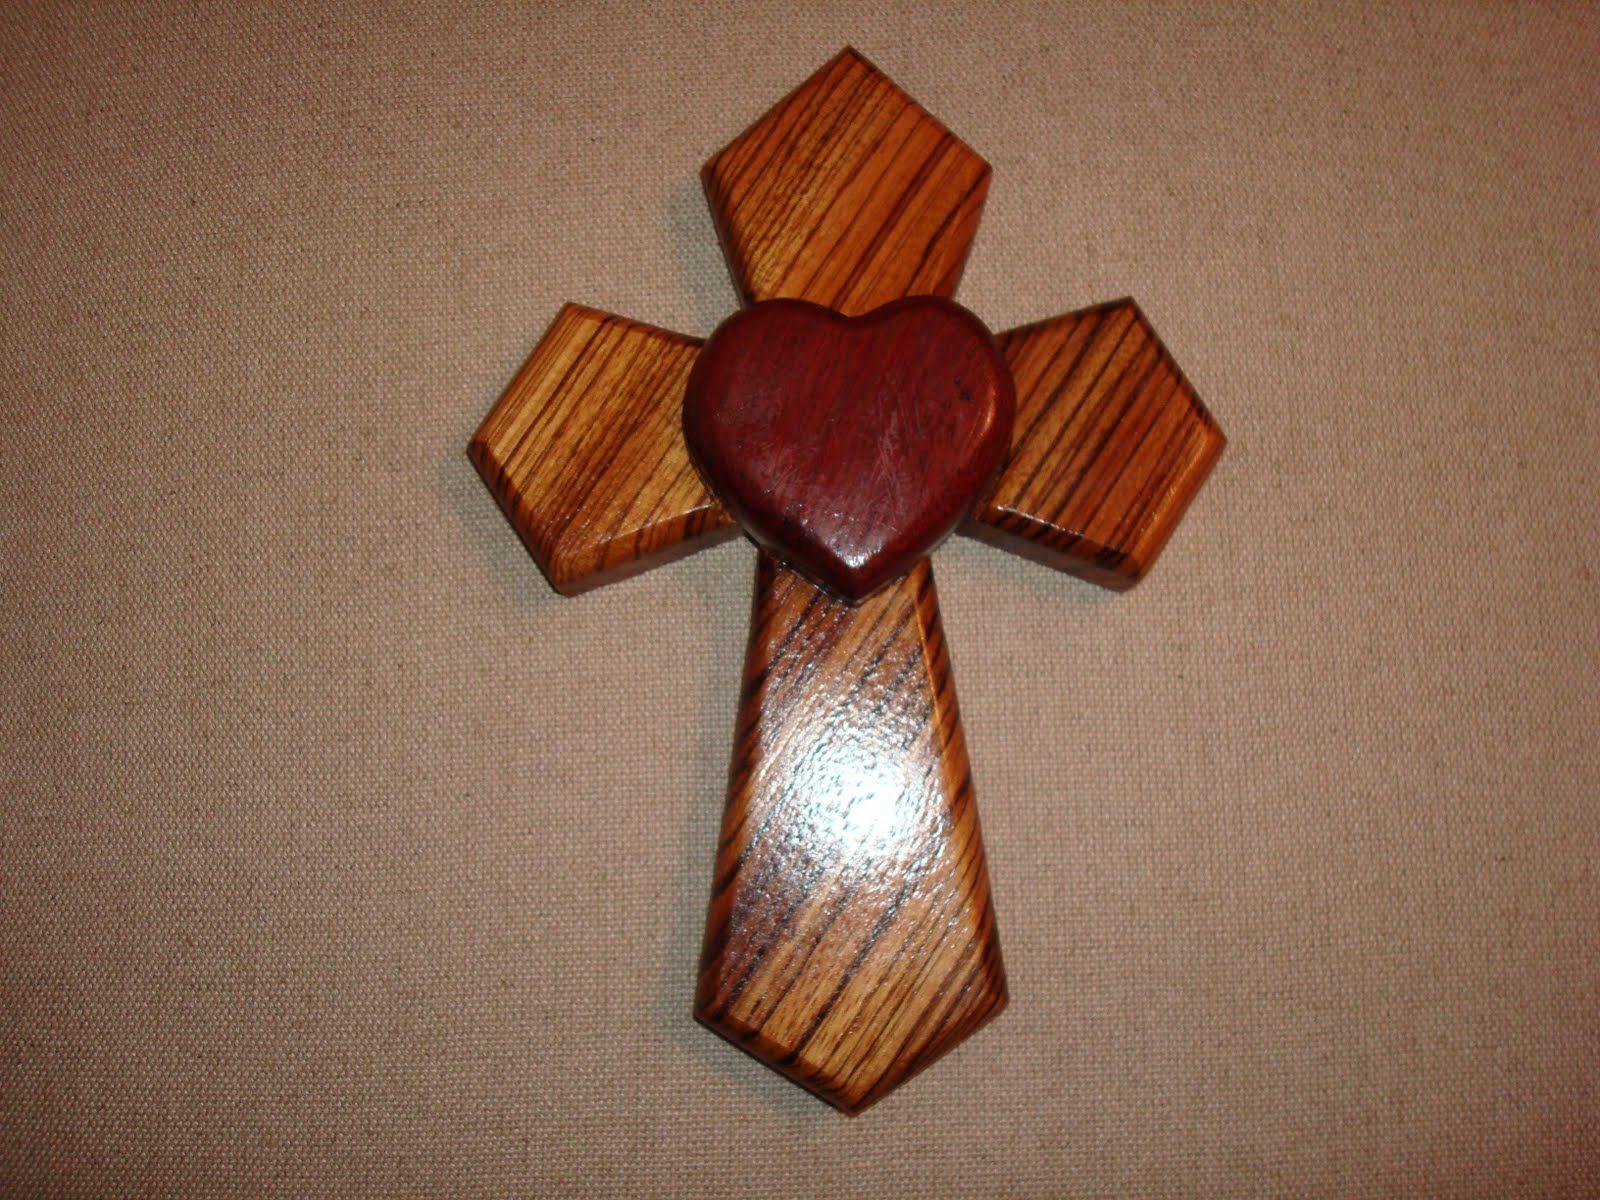 Handmade wooden crosses google search crosses pinterest wood crosses amipublicfo Gallery